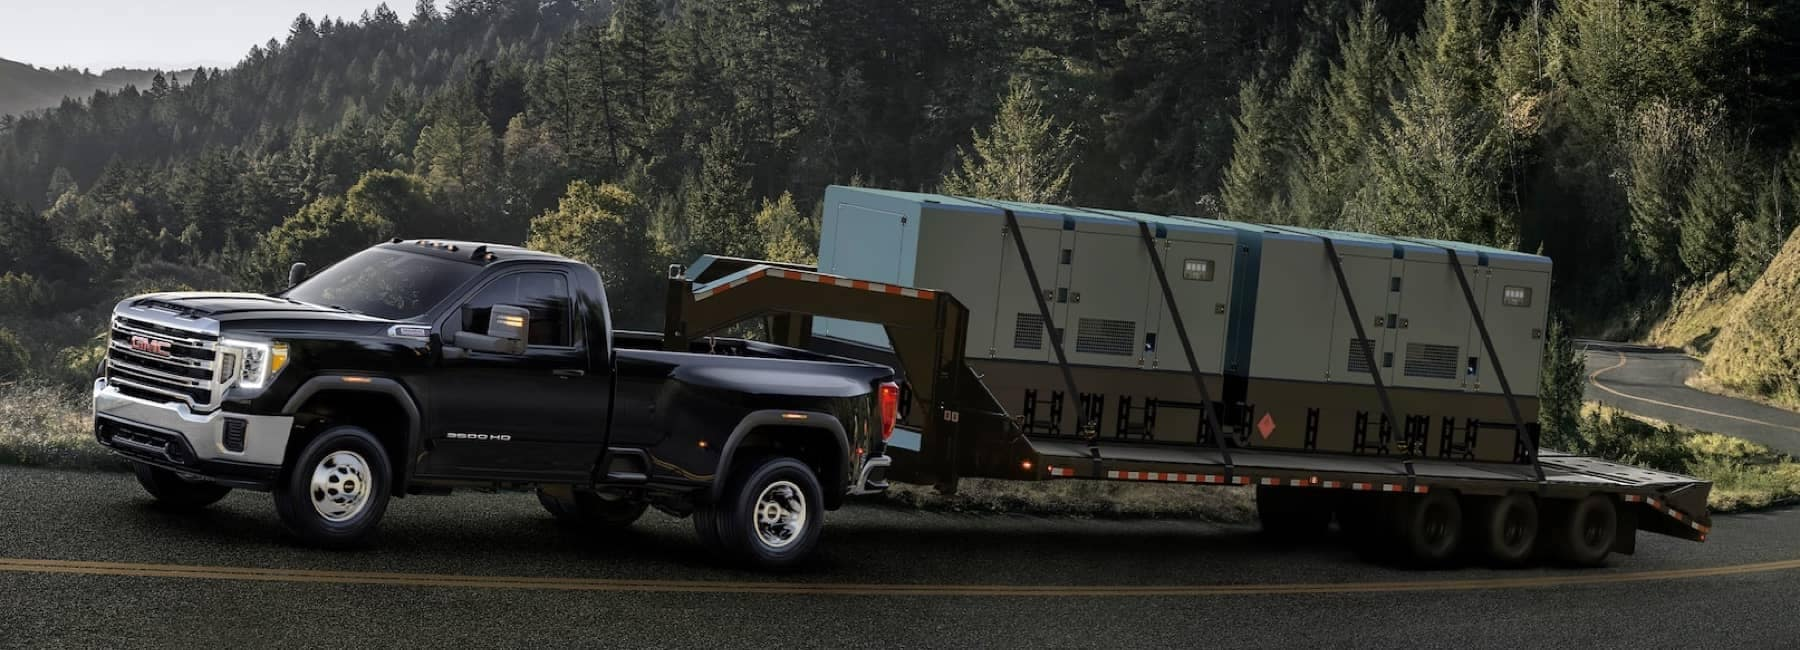 2020 sierra 3500hd with trailer